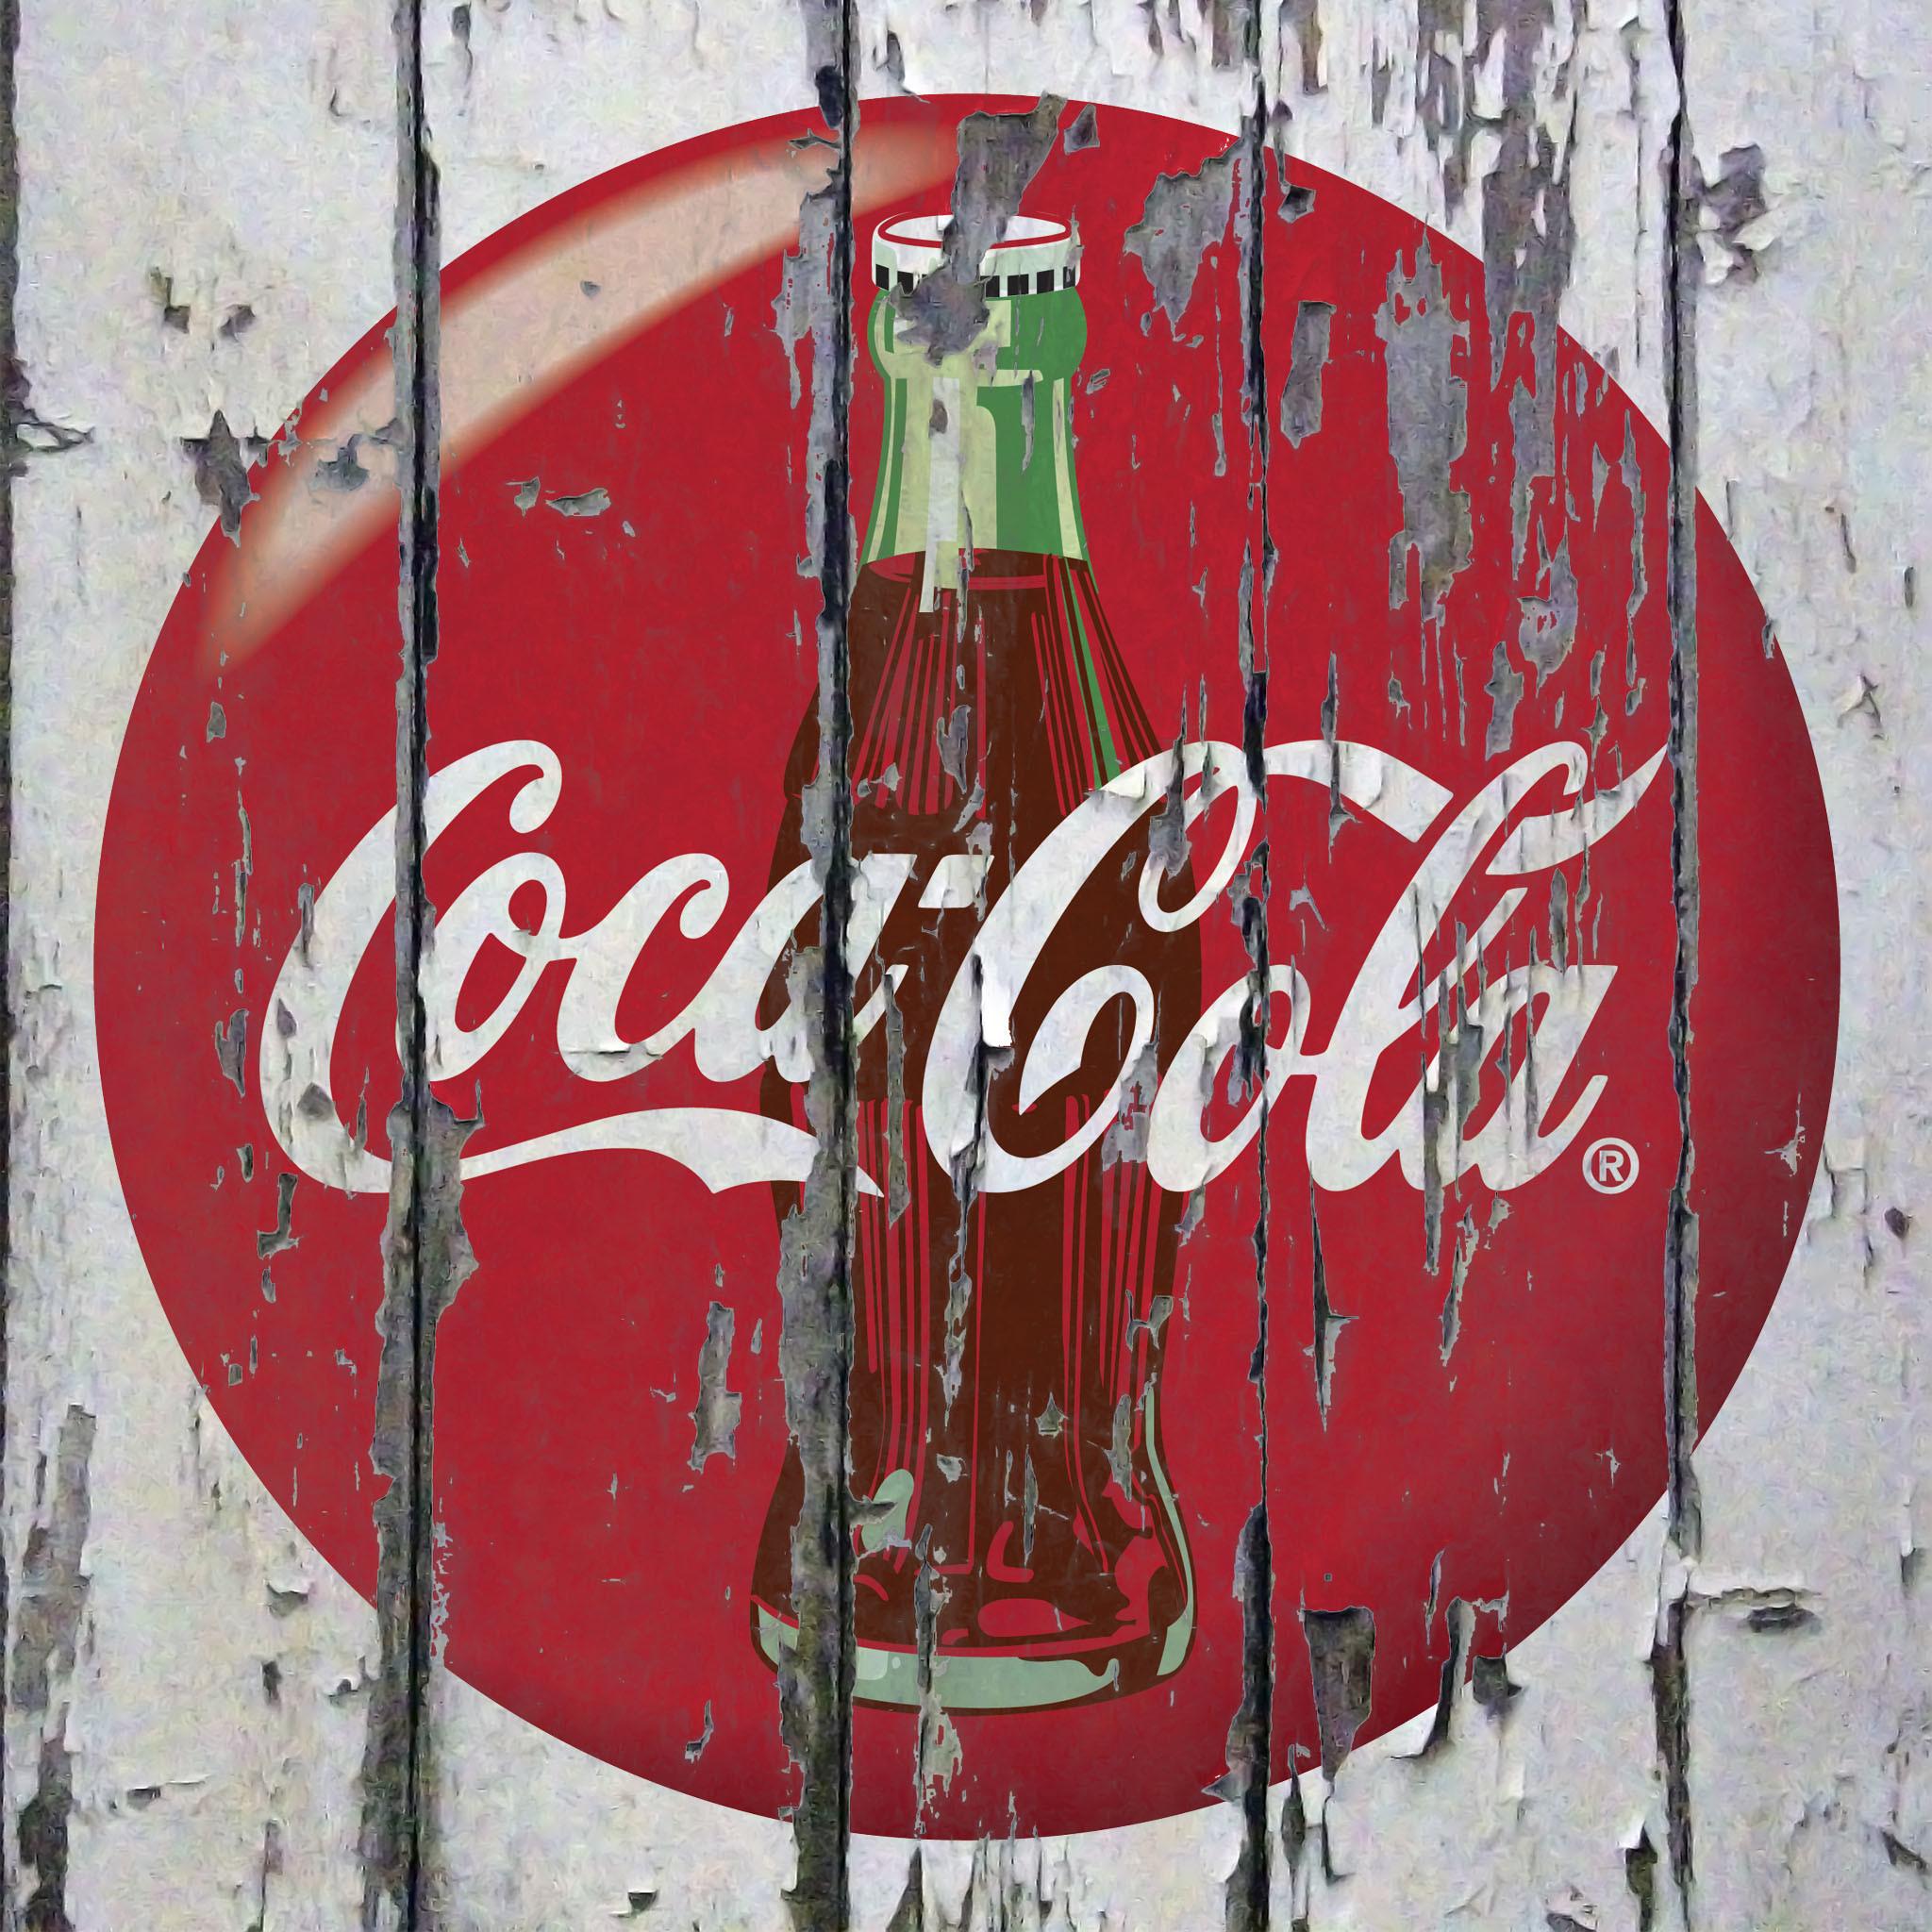 Vintage Iphone Wallpaper: Coca Cola Wallpapers (74+ Images